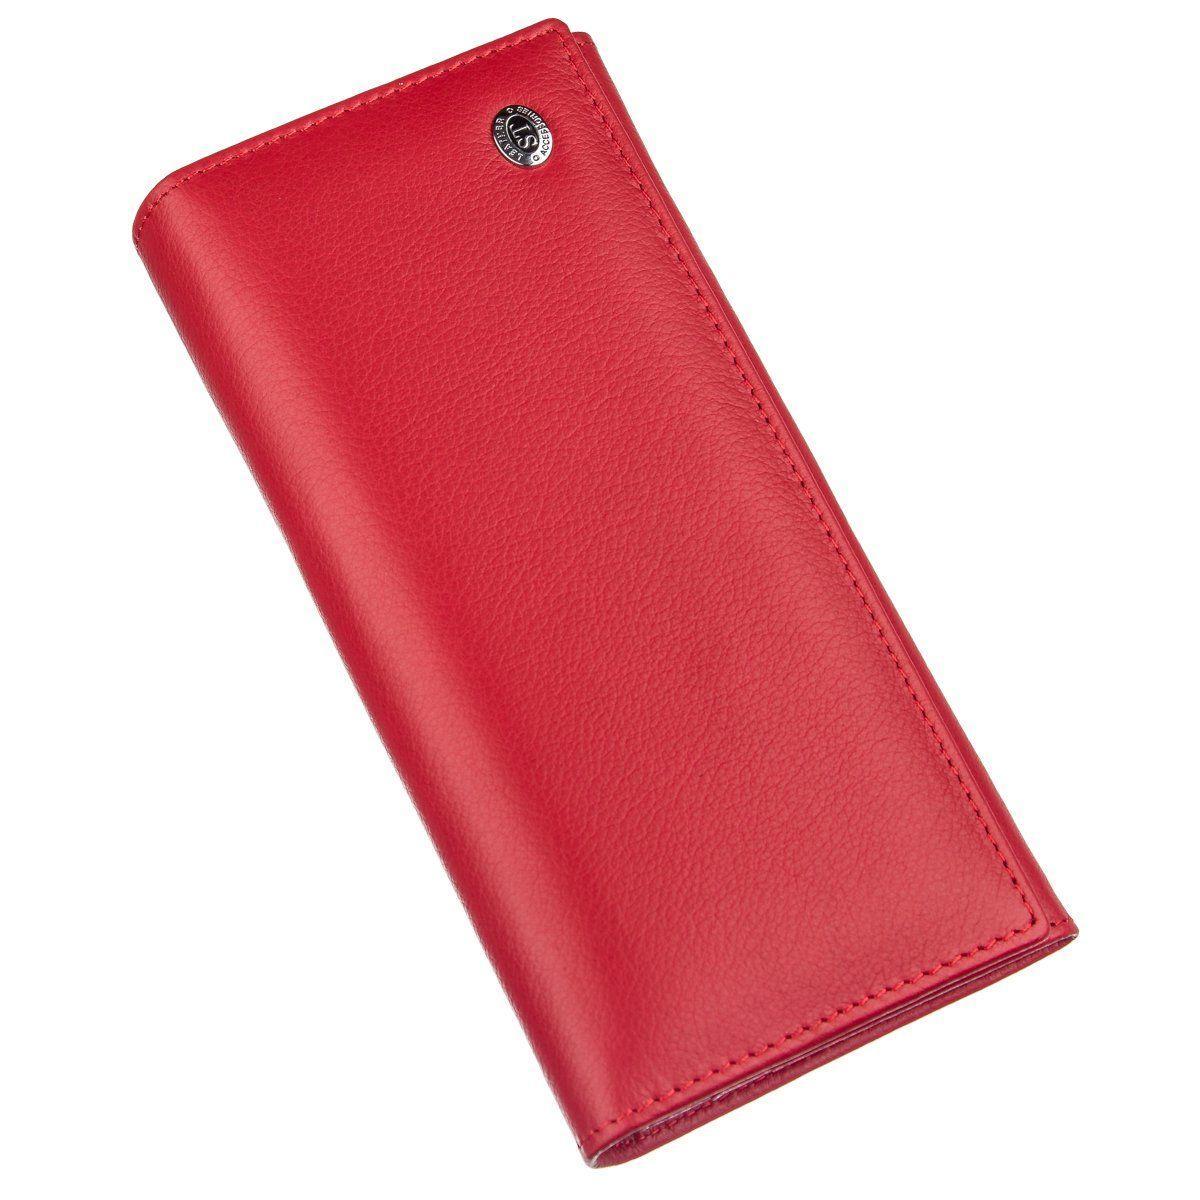 Женский кошелек ST Leather 20093 Красный